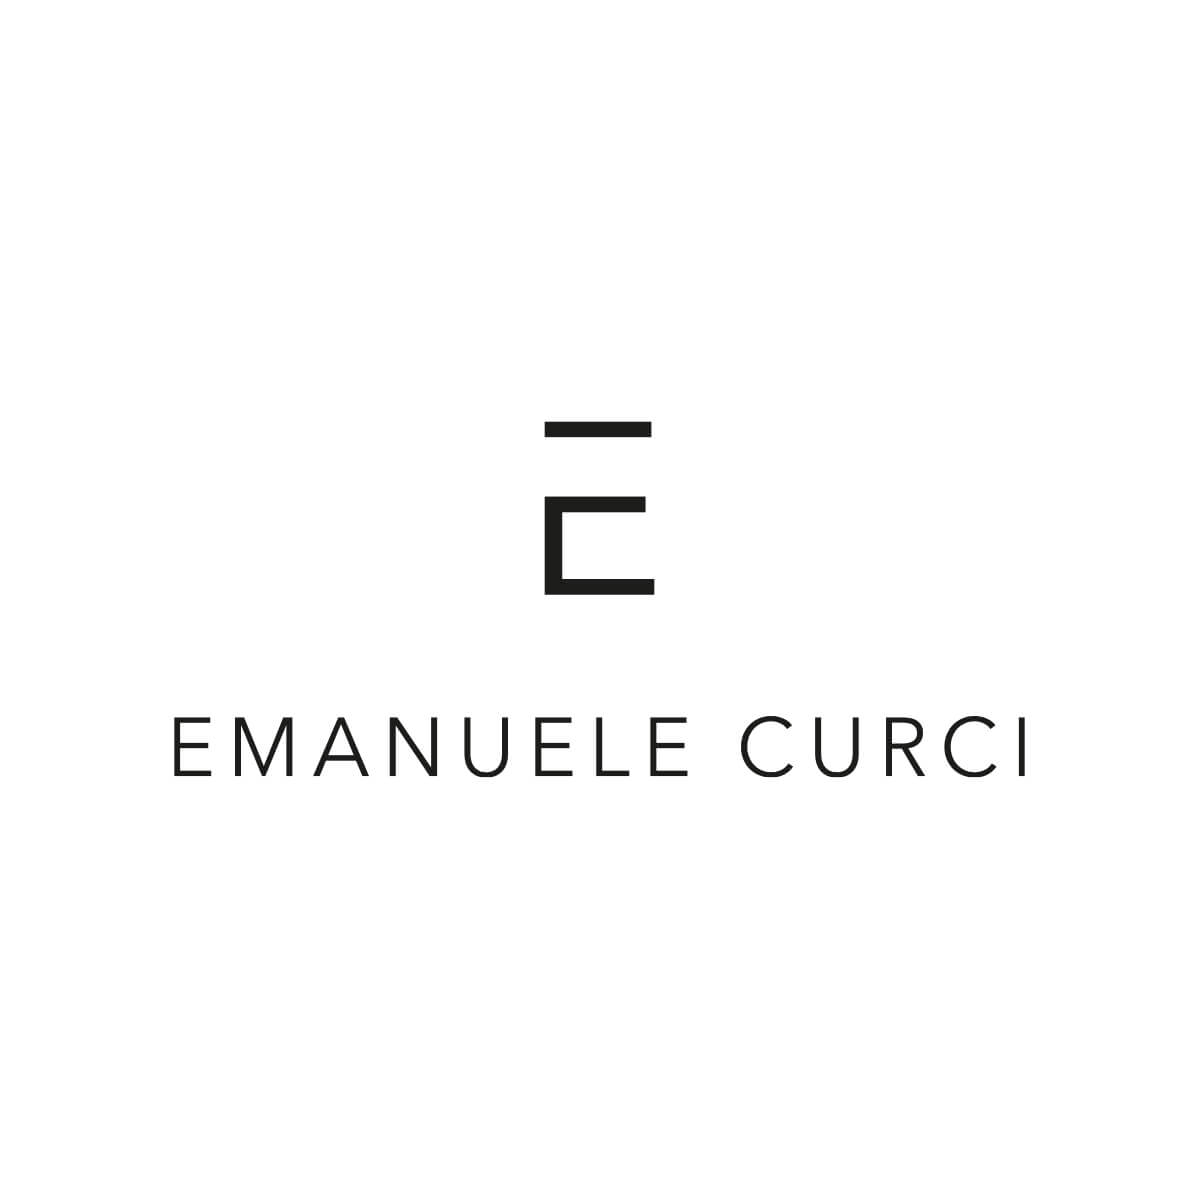 emanuele-curci-logo